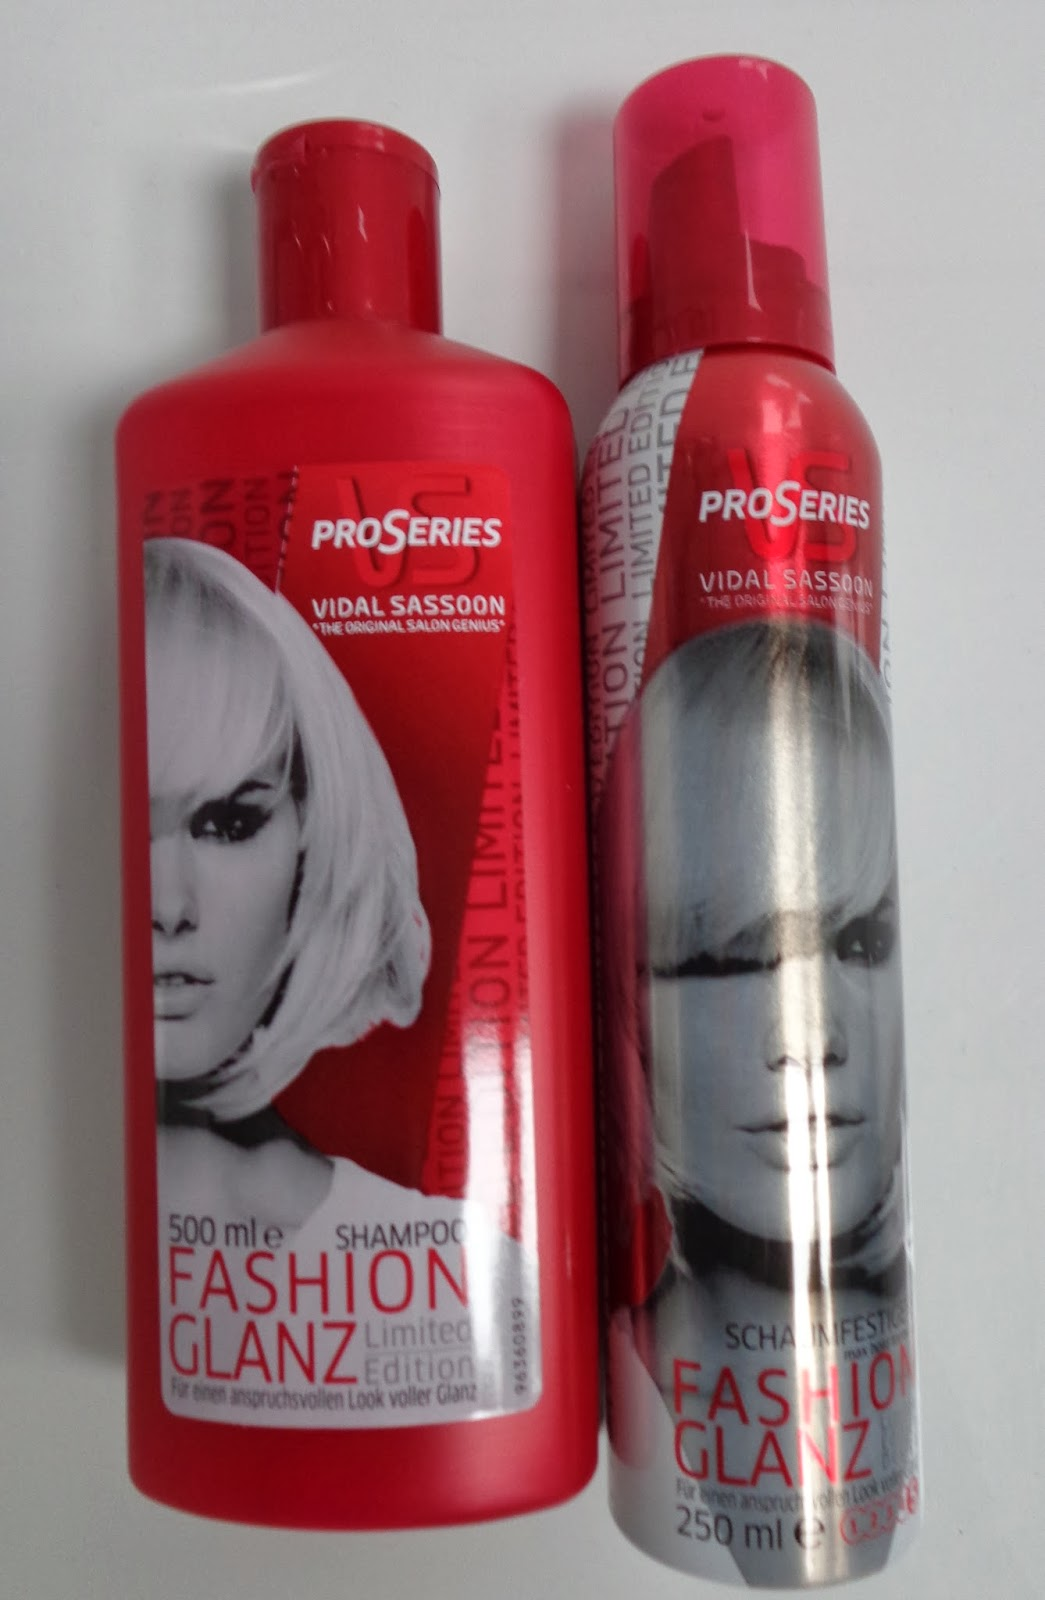 Fashion Glanz; Shampoo; Schaumfestiger